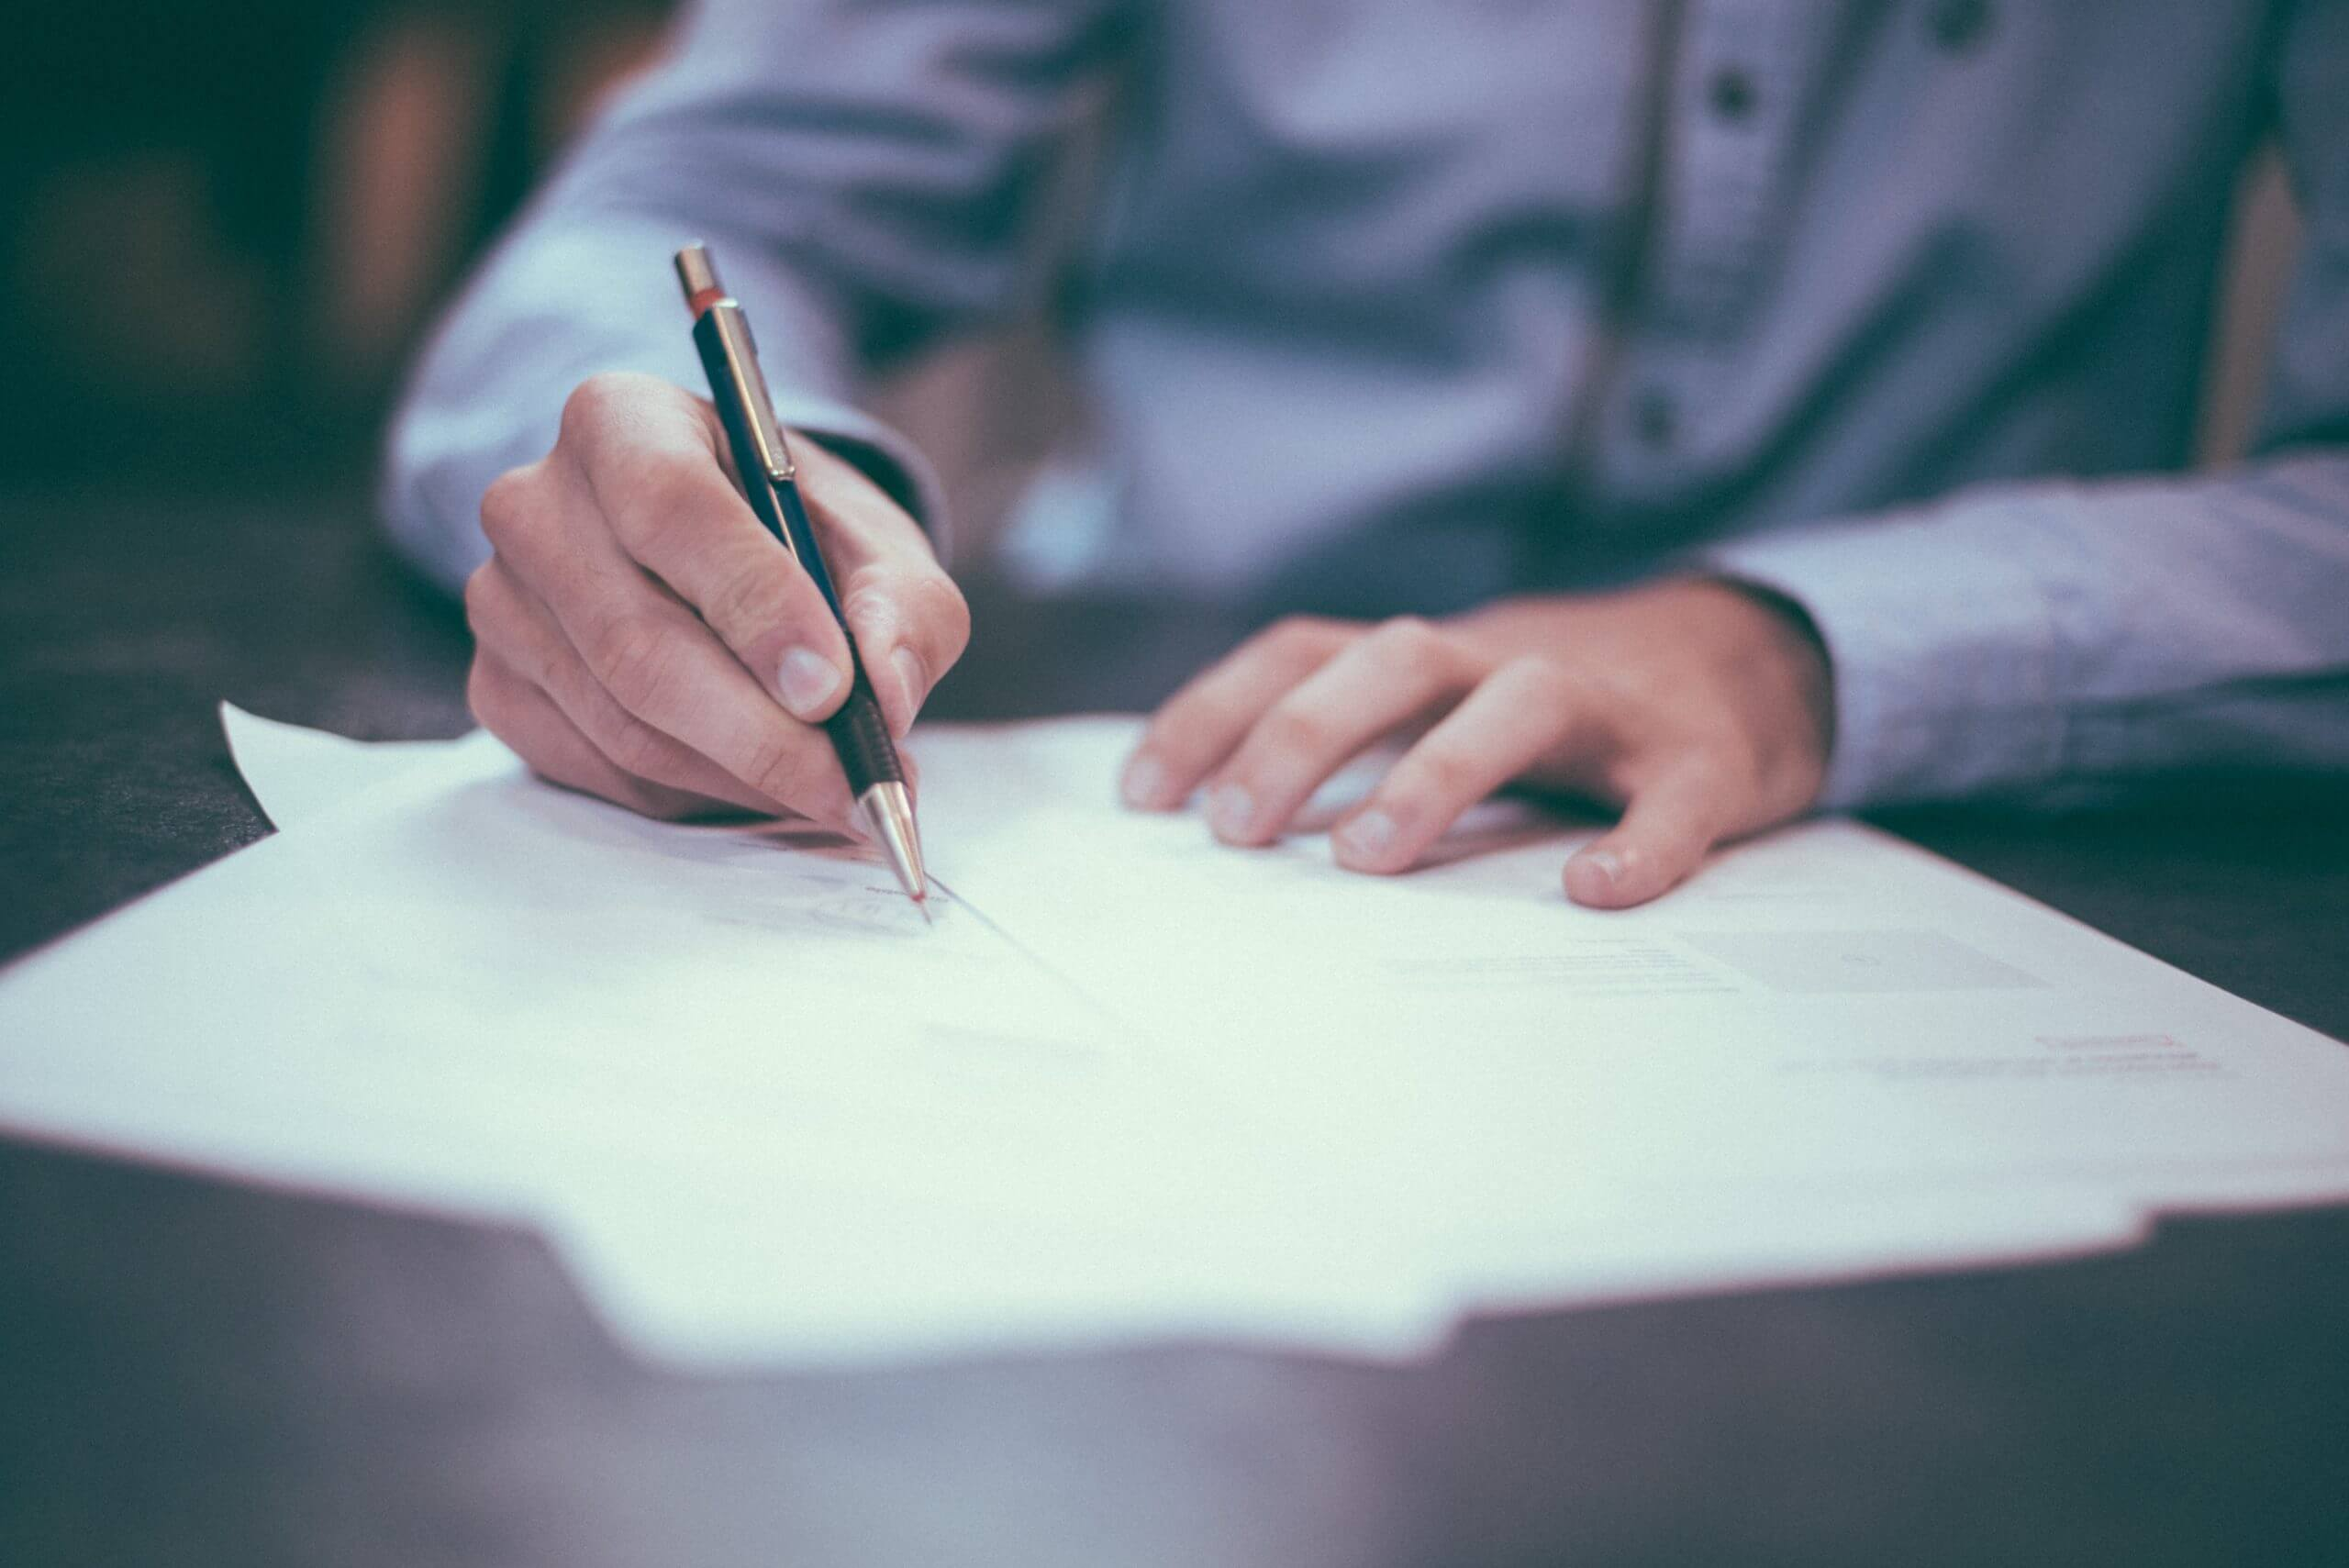 Man writing down april legislation on a piece of paper